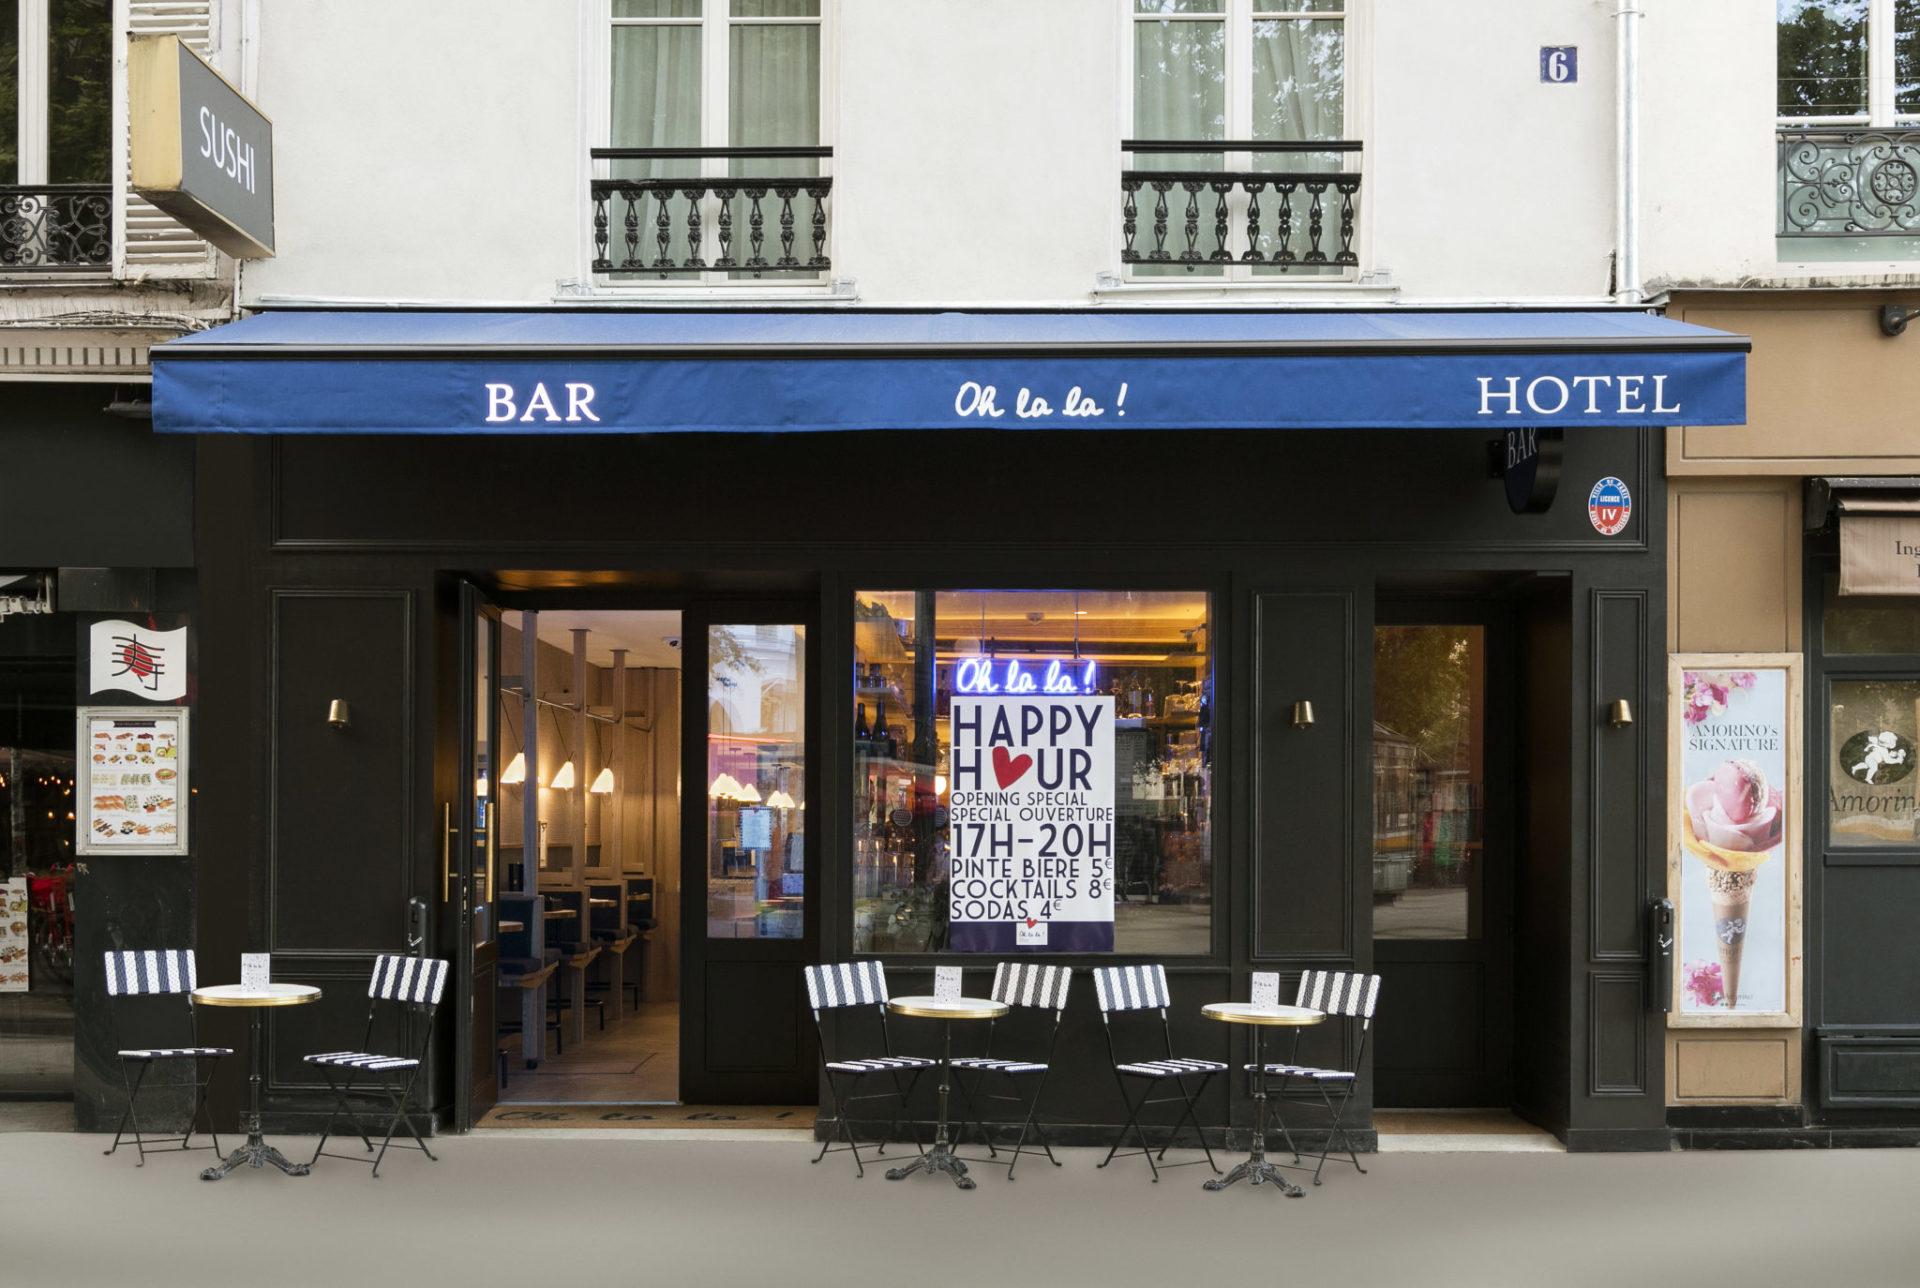 Oh la la ! Hotel Bar